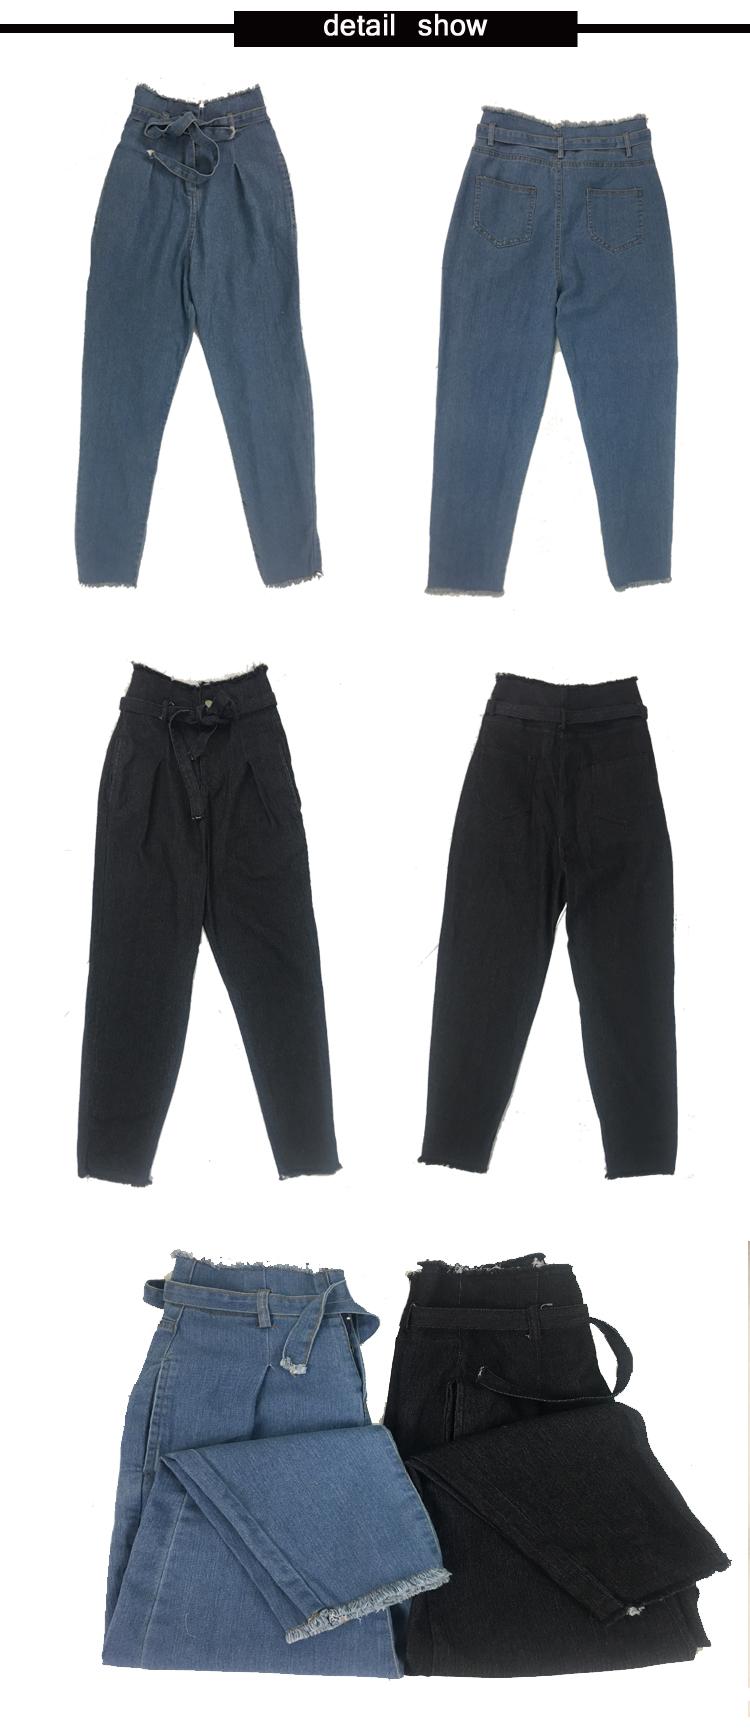 Women High Waist Jeans Sexy Jeans denim Harem Pants jeans womens High Streetwear loose Pants Black Jeans Women Plus size 6